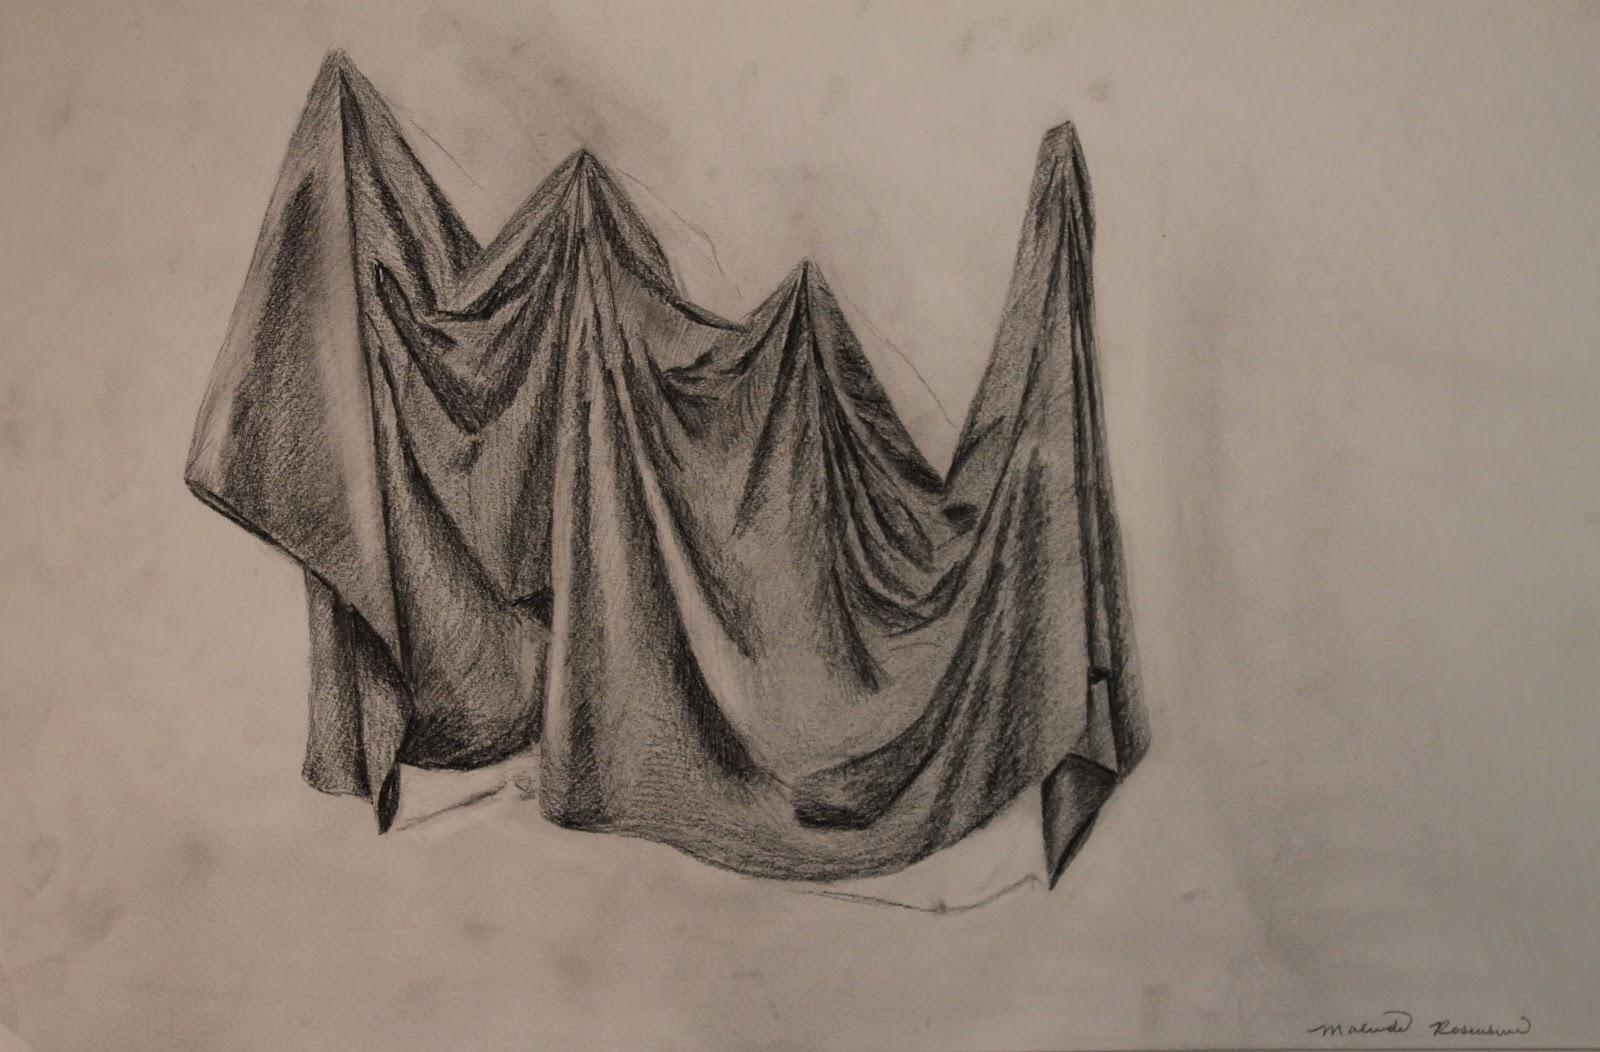 1600x1052 Malinda Rosenswie Fabric Drawings